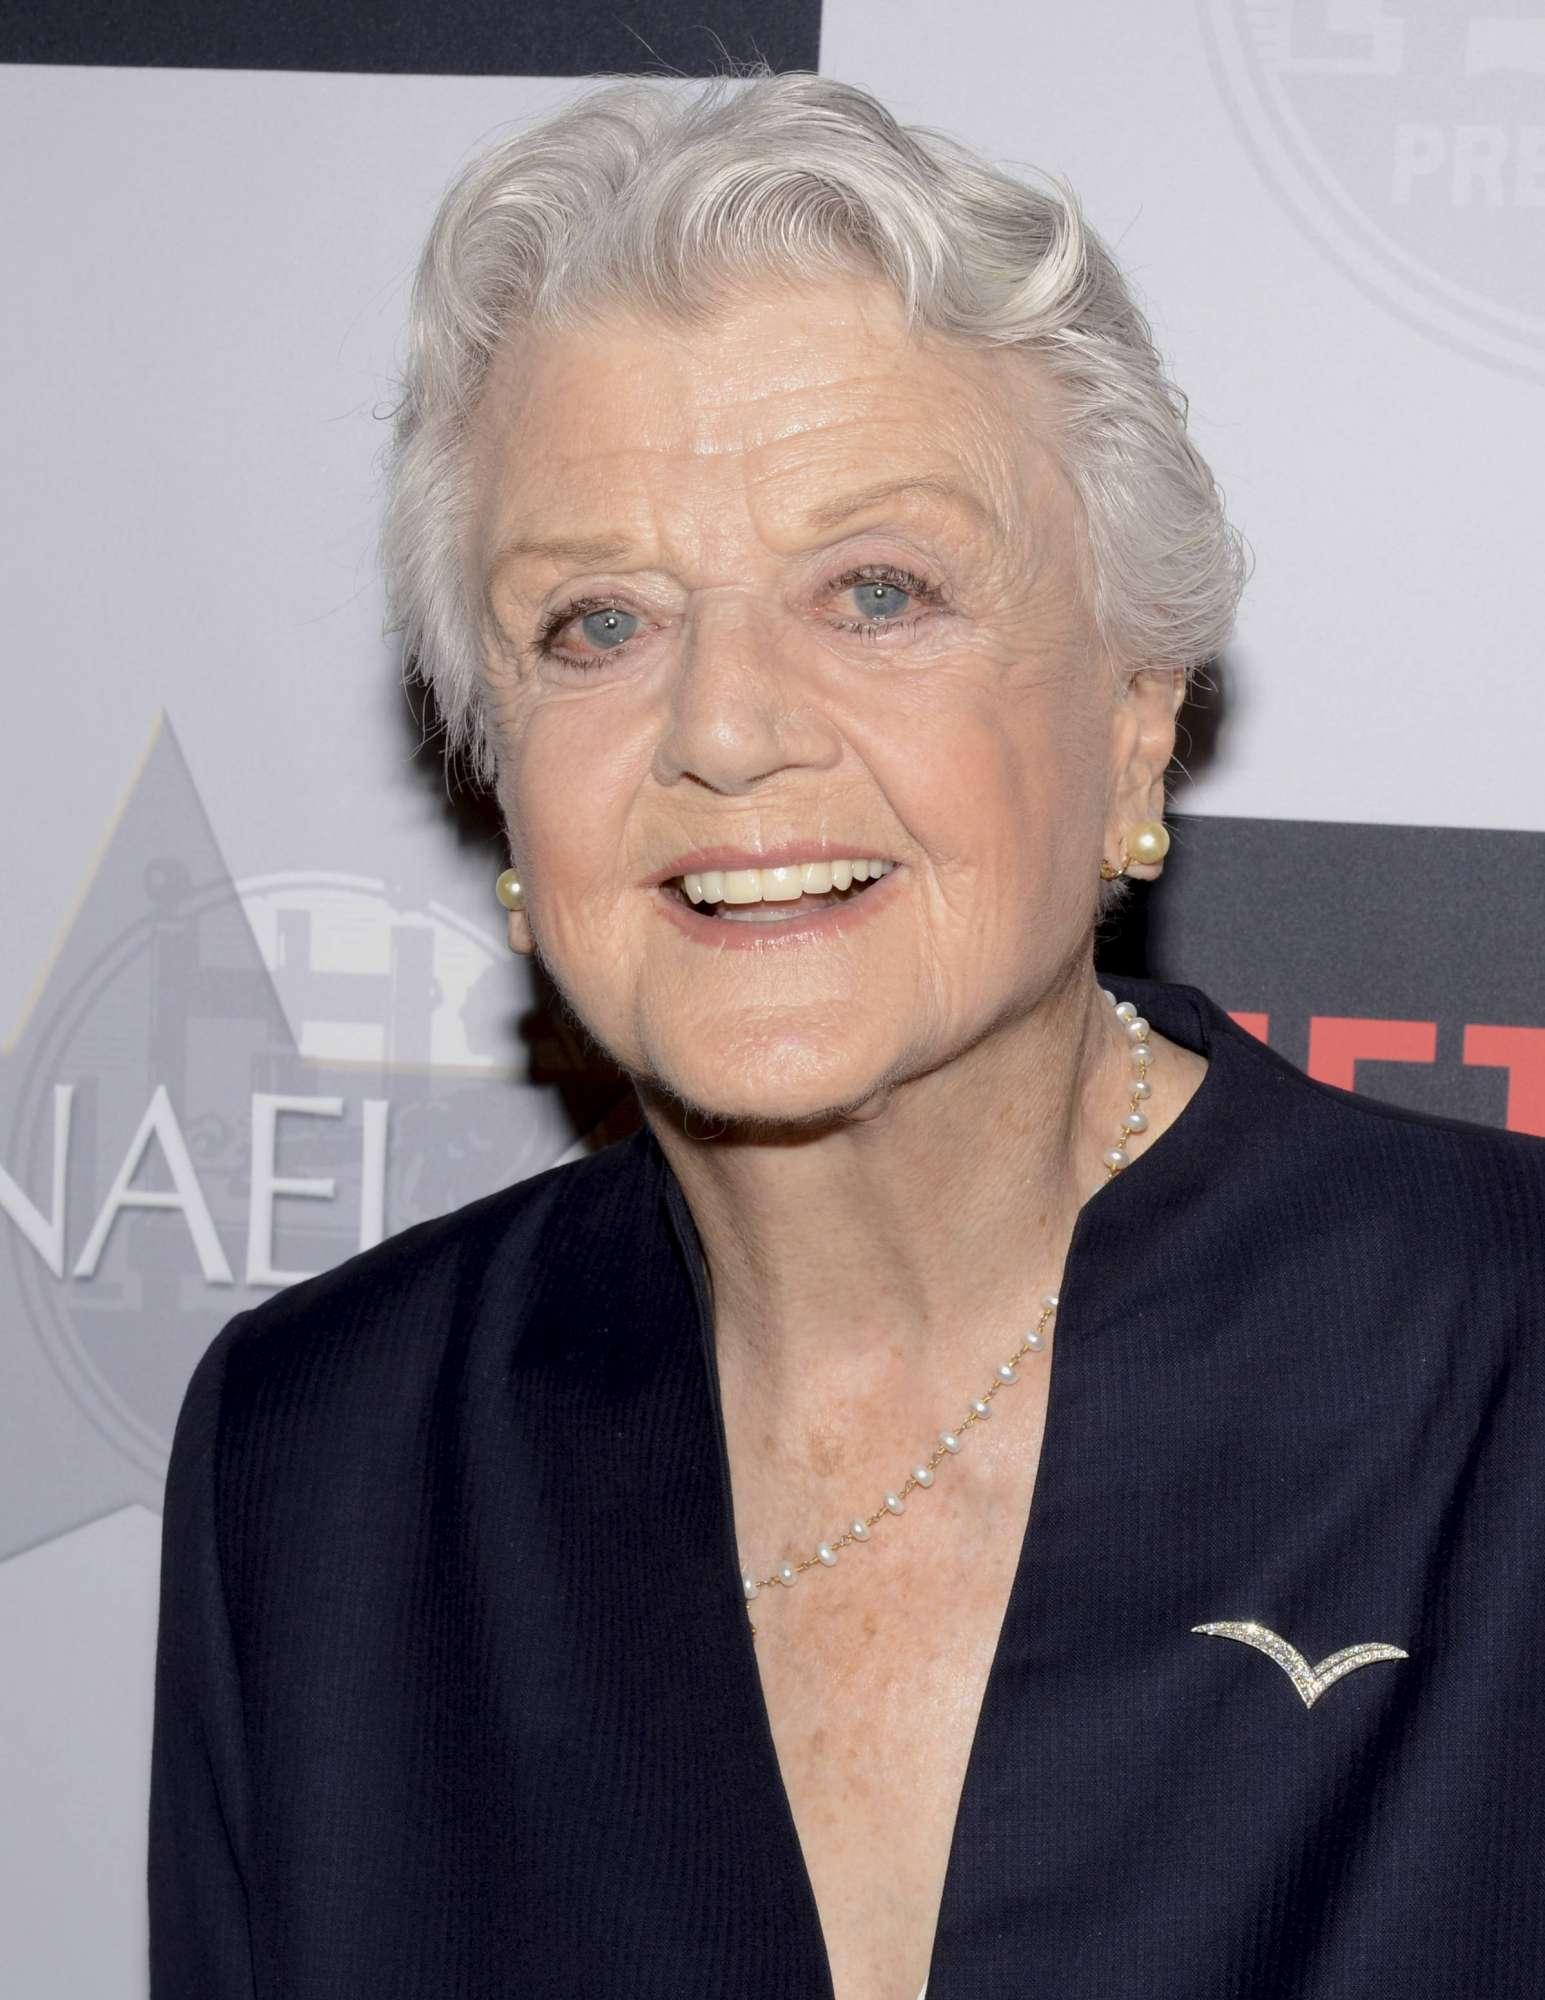 Angela Lansbury, la Signora in giallo premiata a Los Angeles